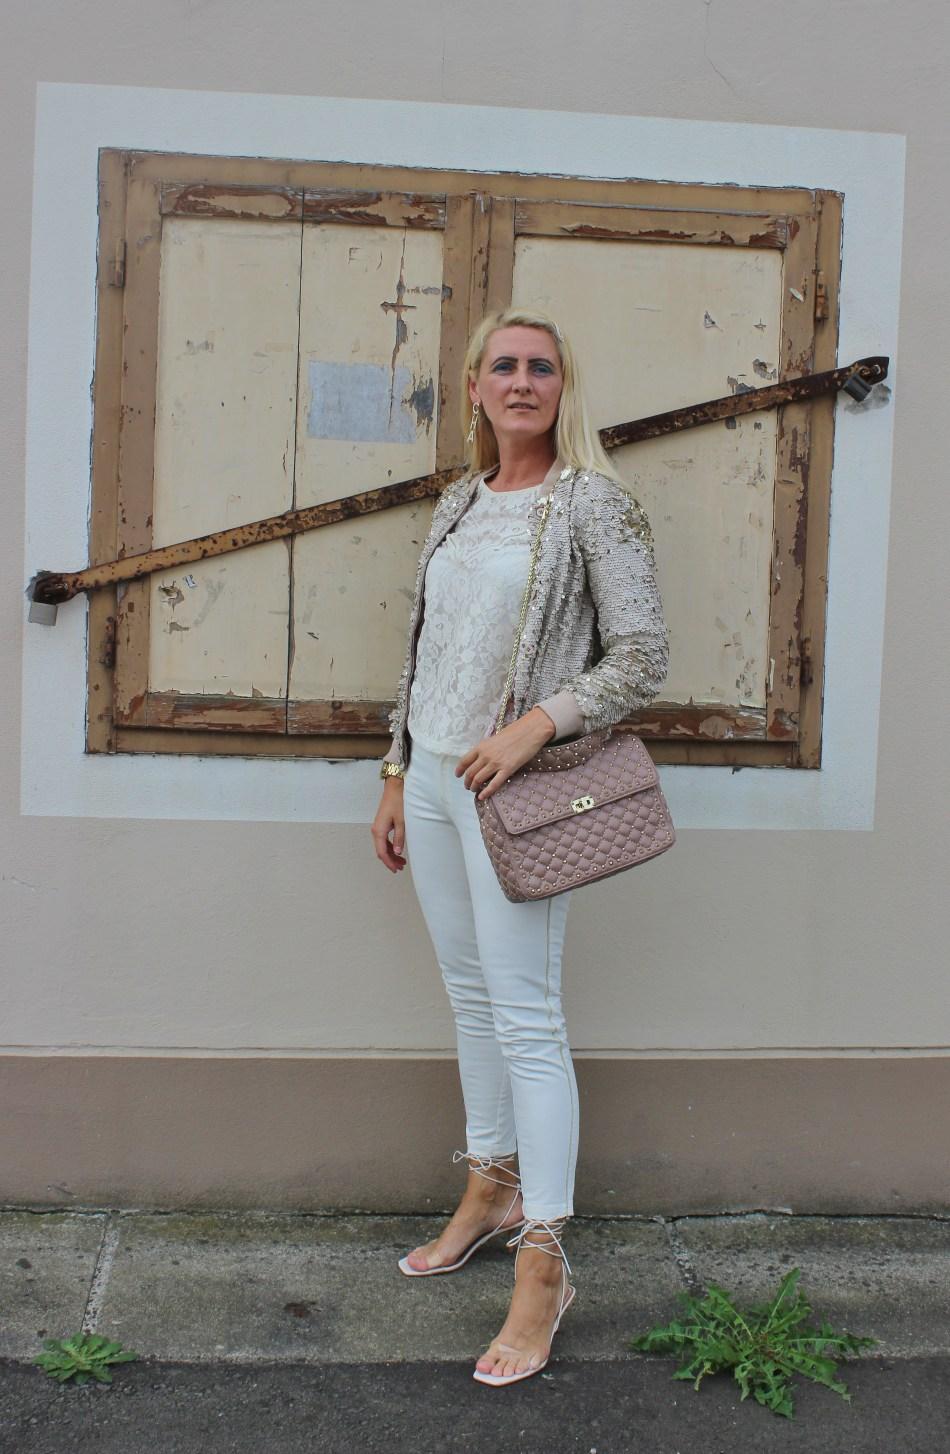 Pailletten-Bomberjacke-Strappy-Heels-Allinwhite-Valentino-Rockstud-Bag-carrieslifestyle-Tamara-Prutsch-Lace-Top